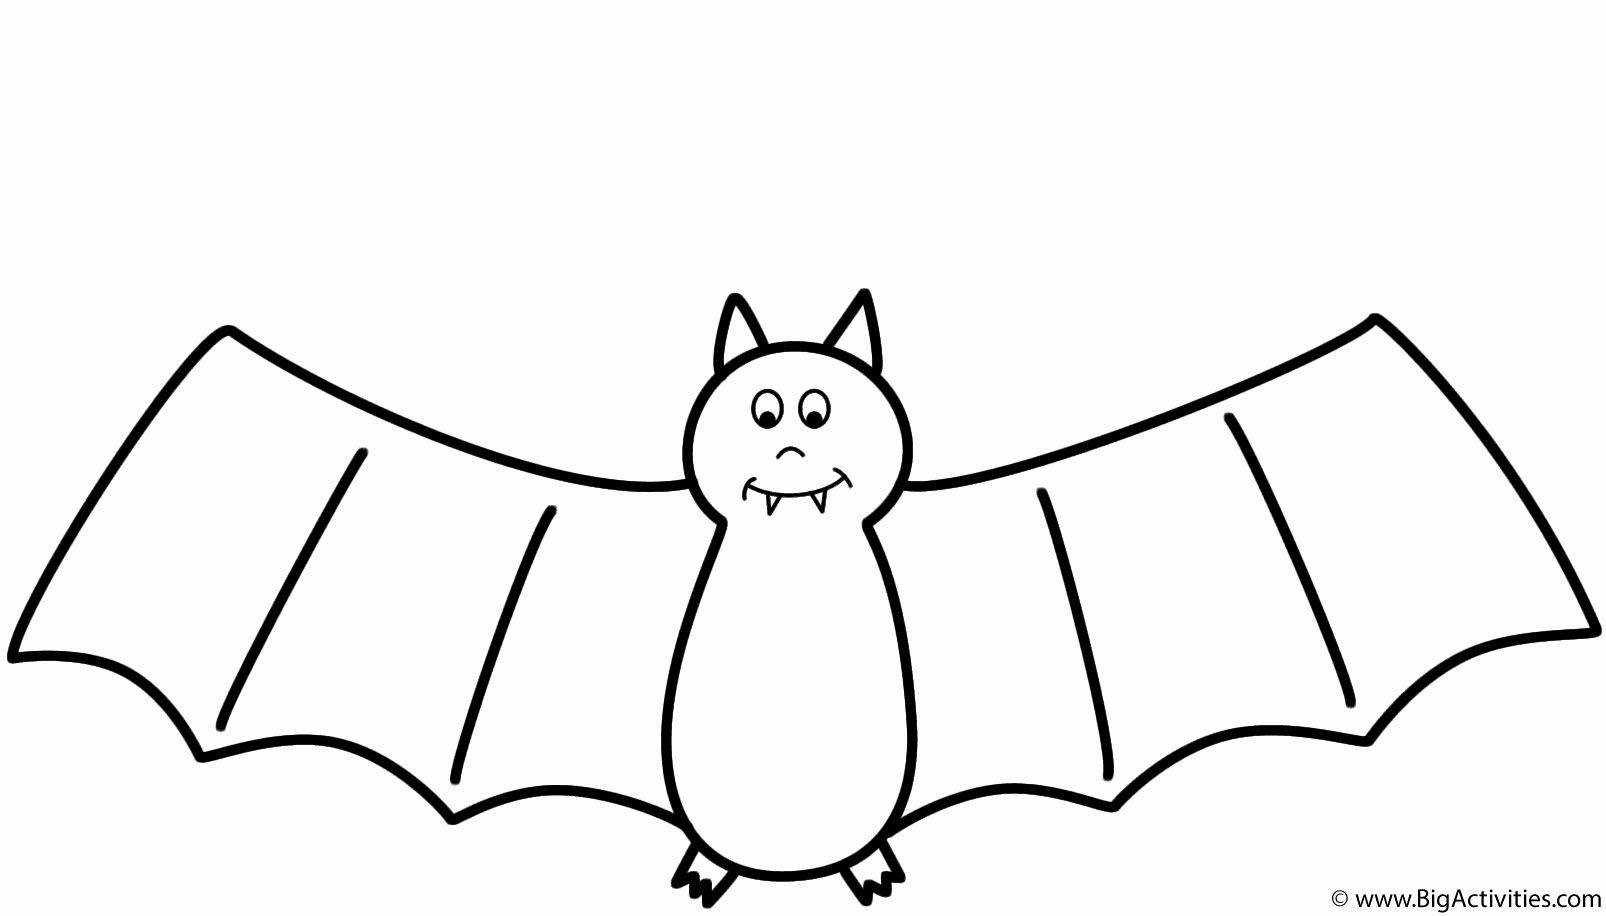 Bat Coloring Pages Beautiful Bat Coloring Page Halloween Halloween Coloring Pages Bat Coloring Page Bat Coloring Pages